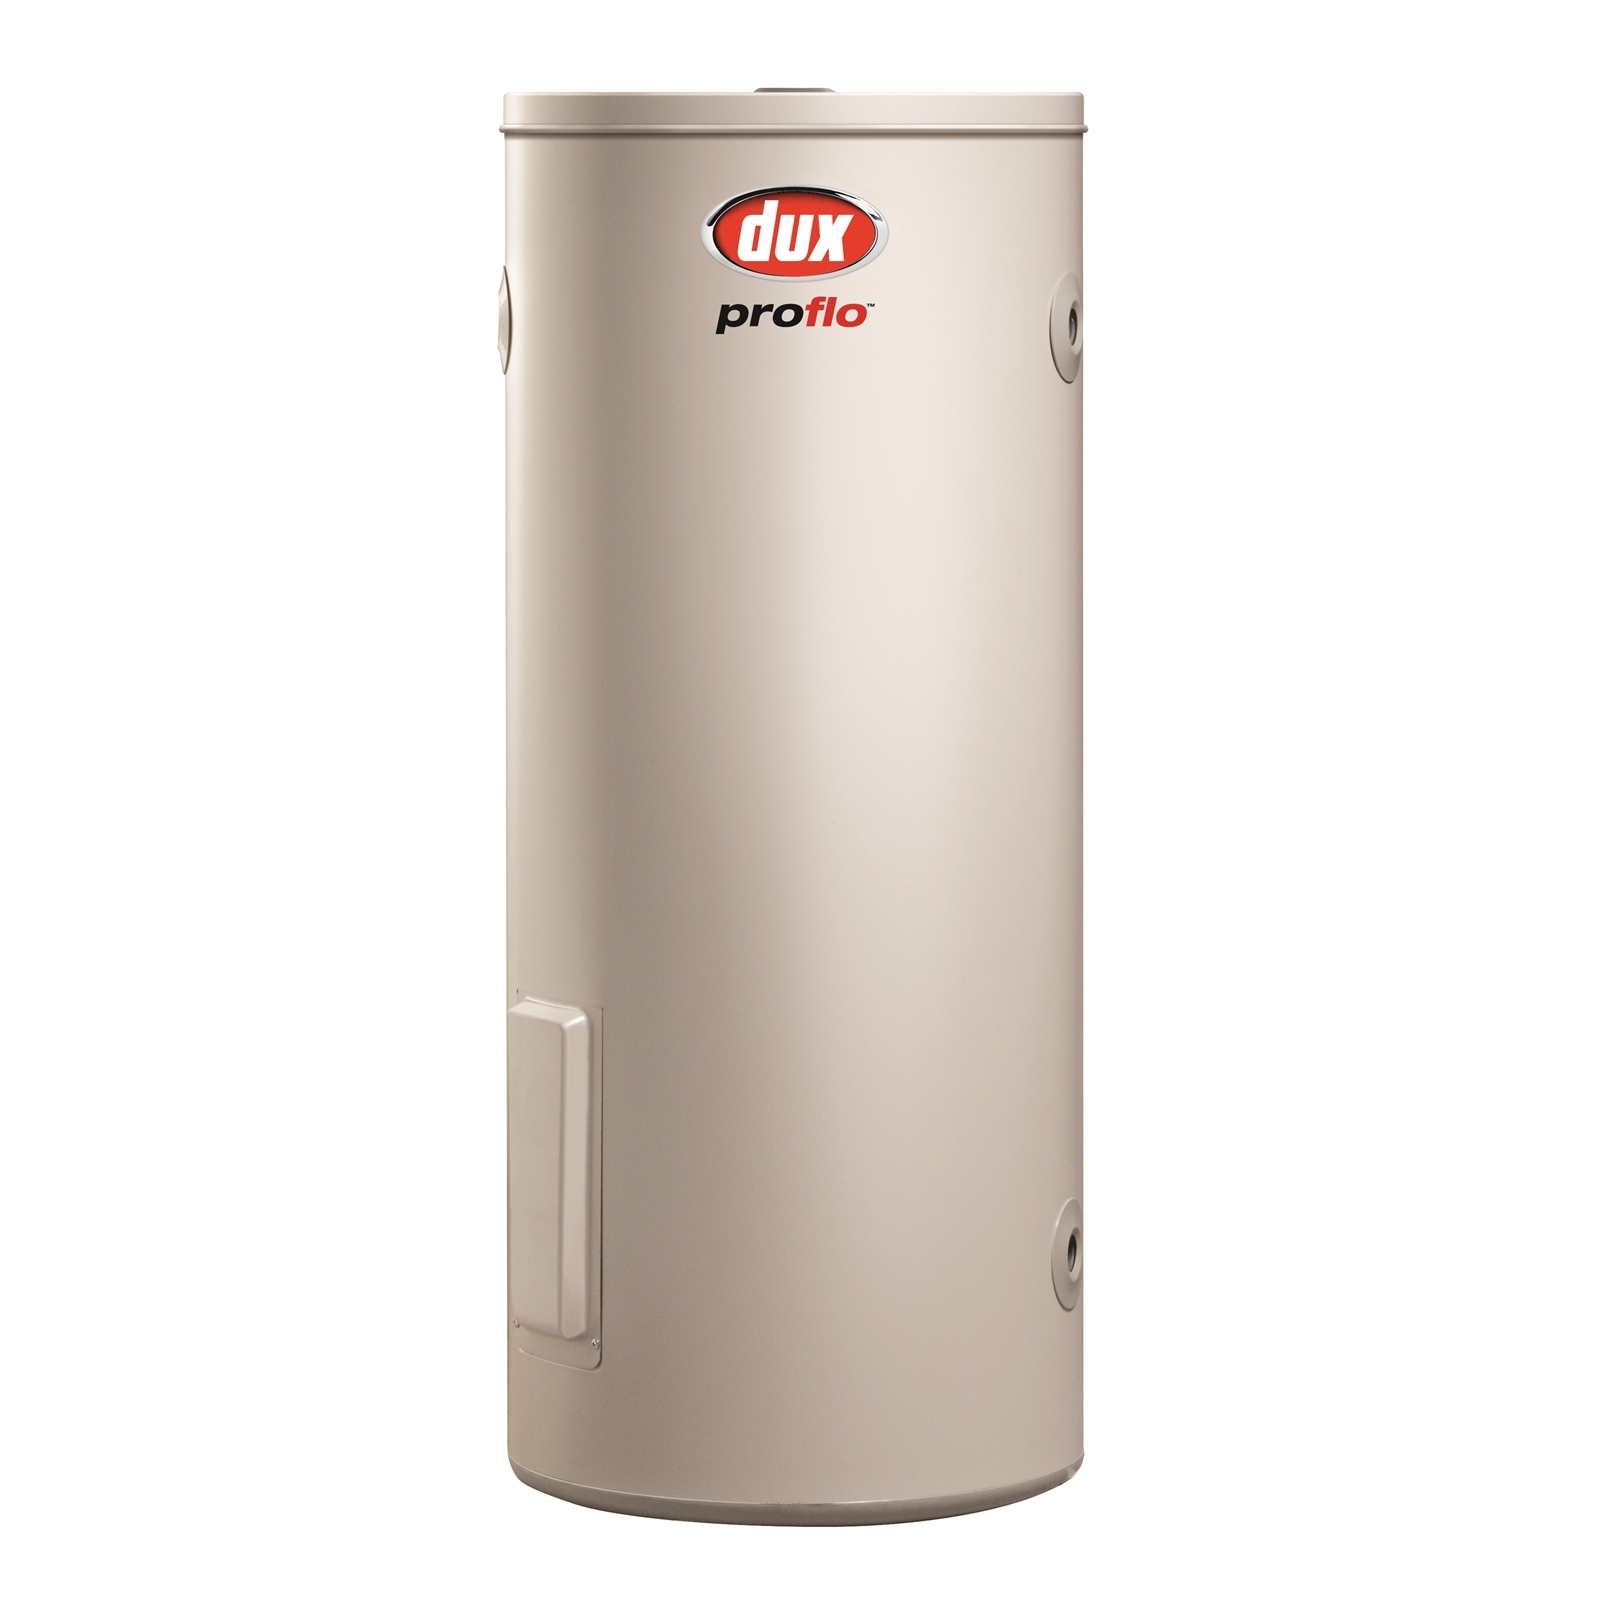 Dux 160L 2.4kW Proflo Electric Storage Water Heater